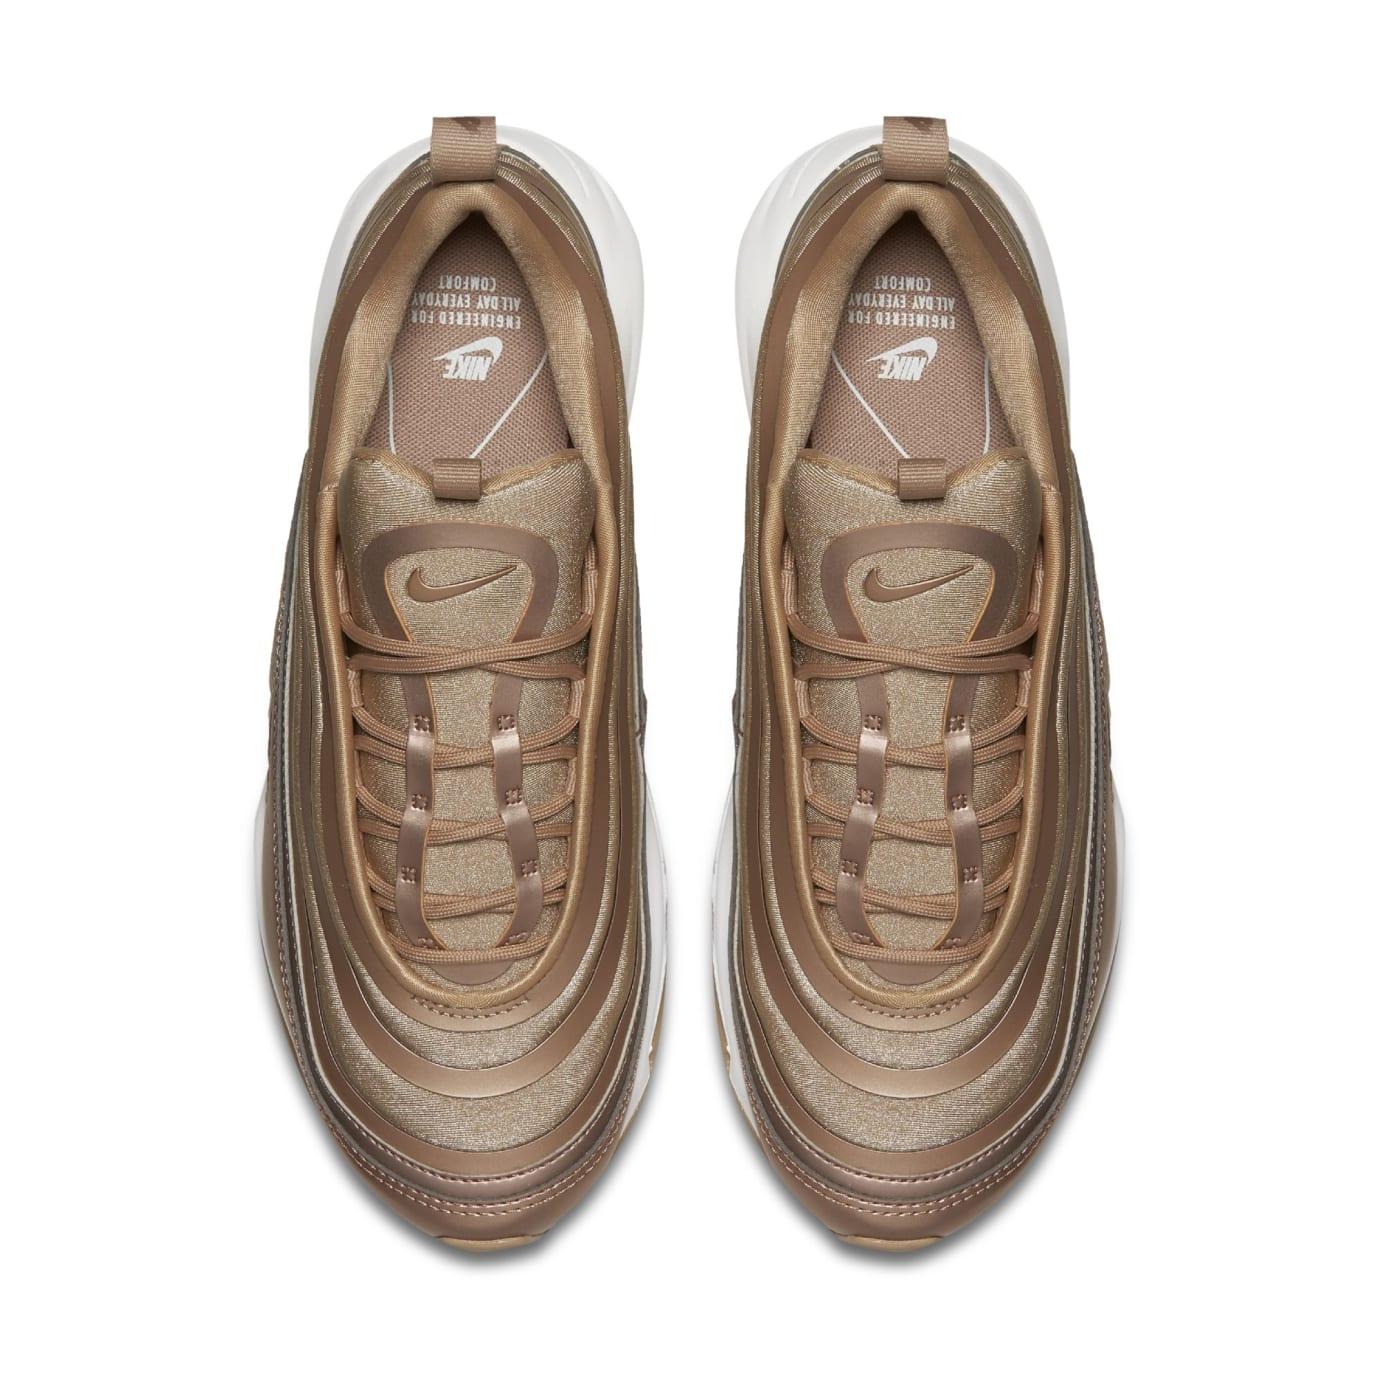 Nike Air Max 97 Ultra Metallic Bronze (Top)